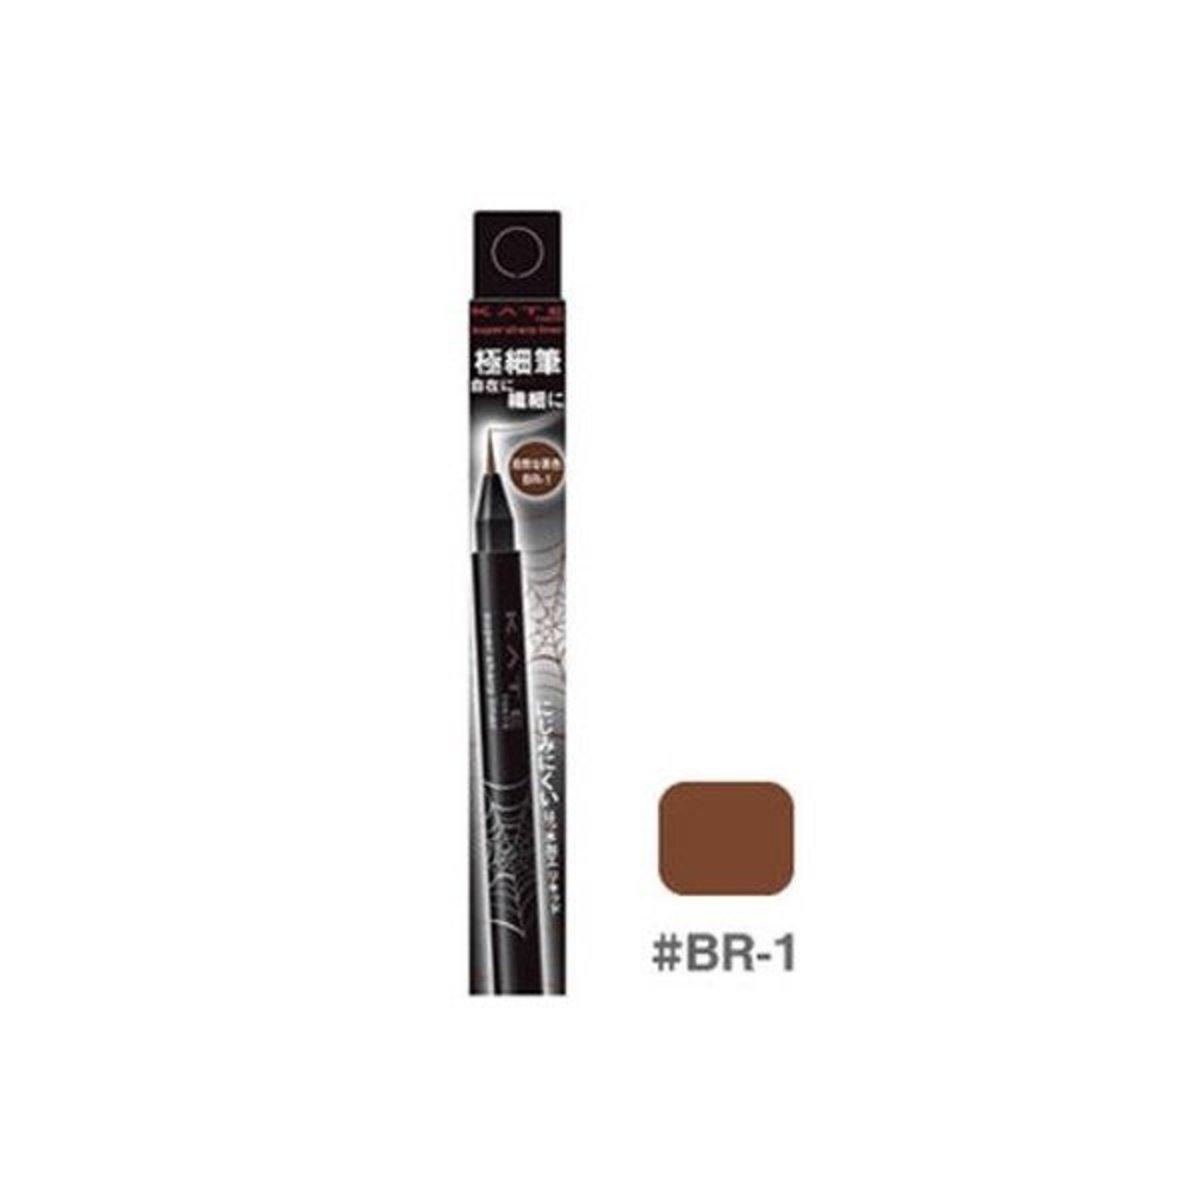 KATE 液體眼線筆 - LB-1棕色   [平行進口產品]